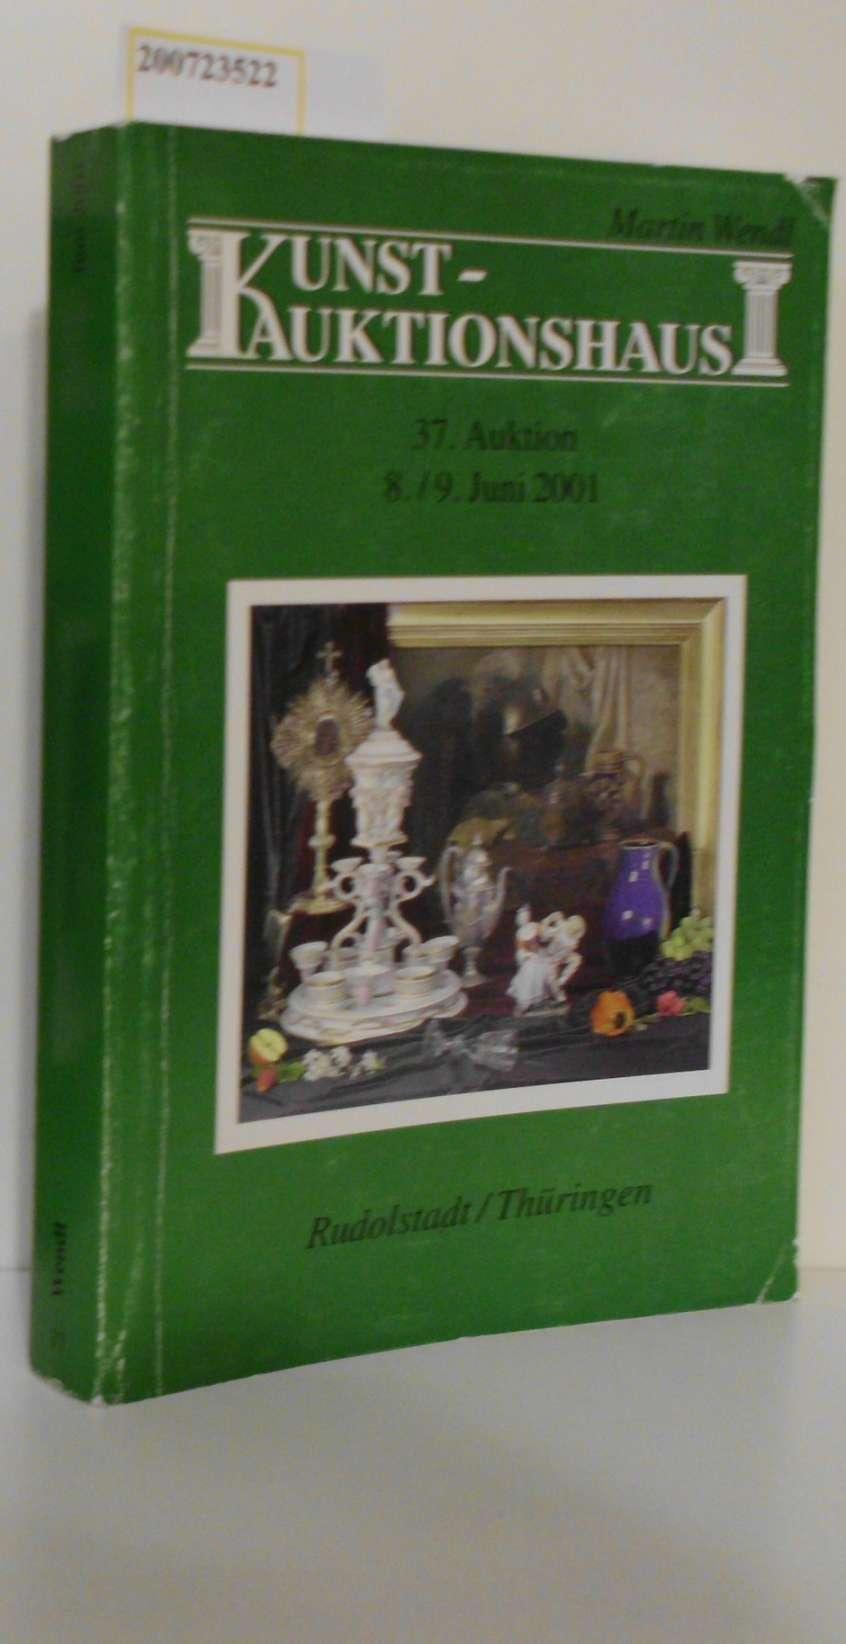 Kunstauktionshaus Martin Wendl 37. Auktion 8./9. Juni 2001